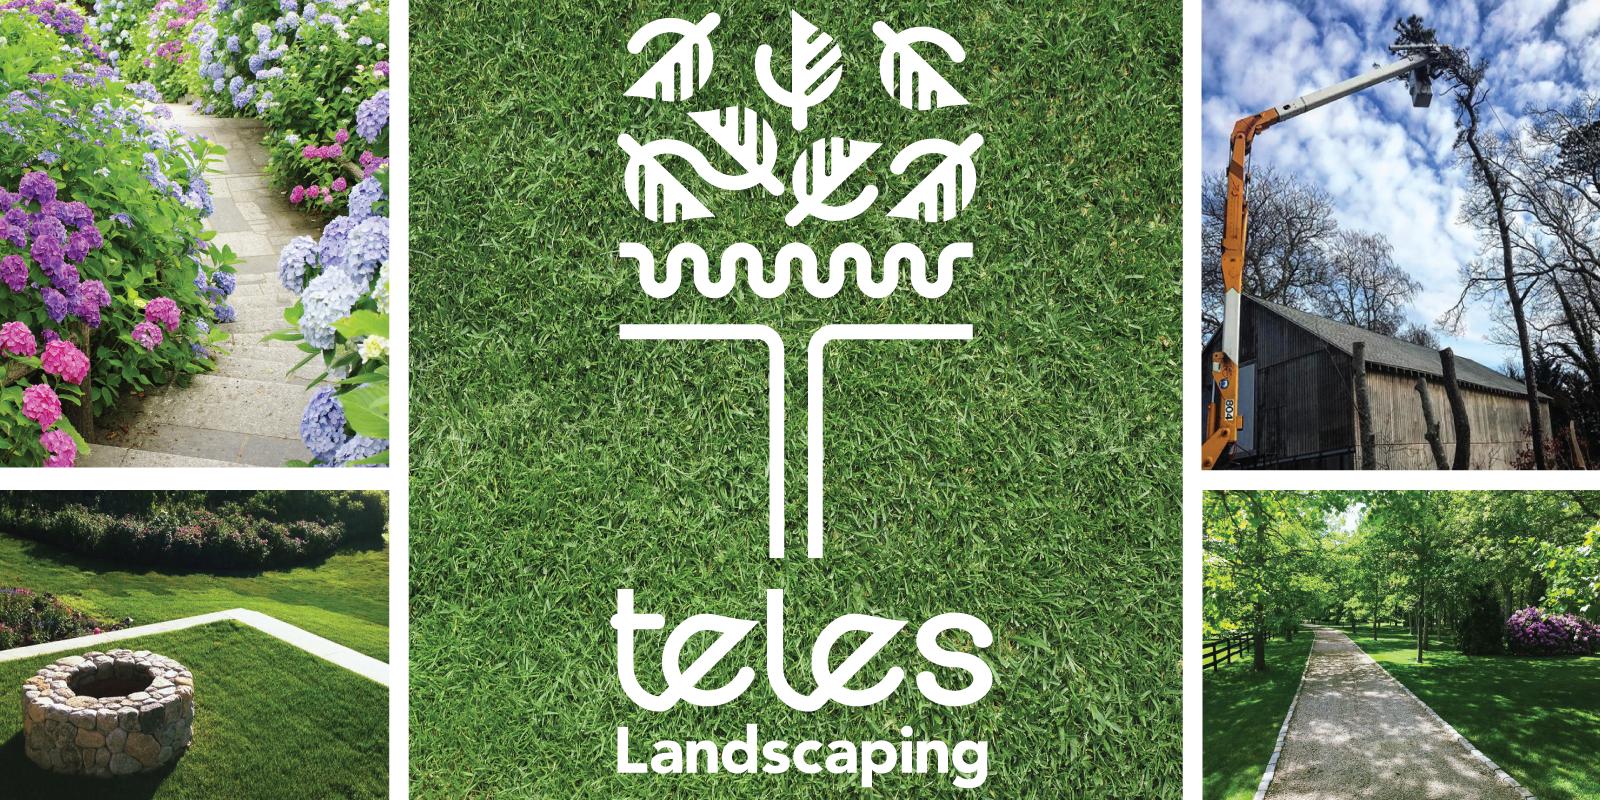 Teles Landscaping